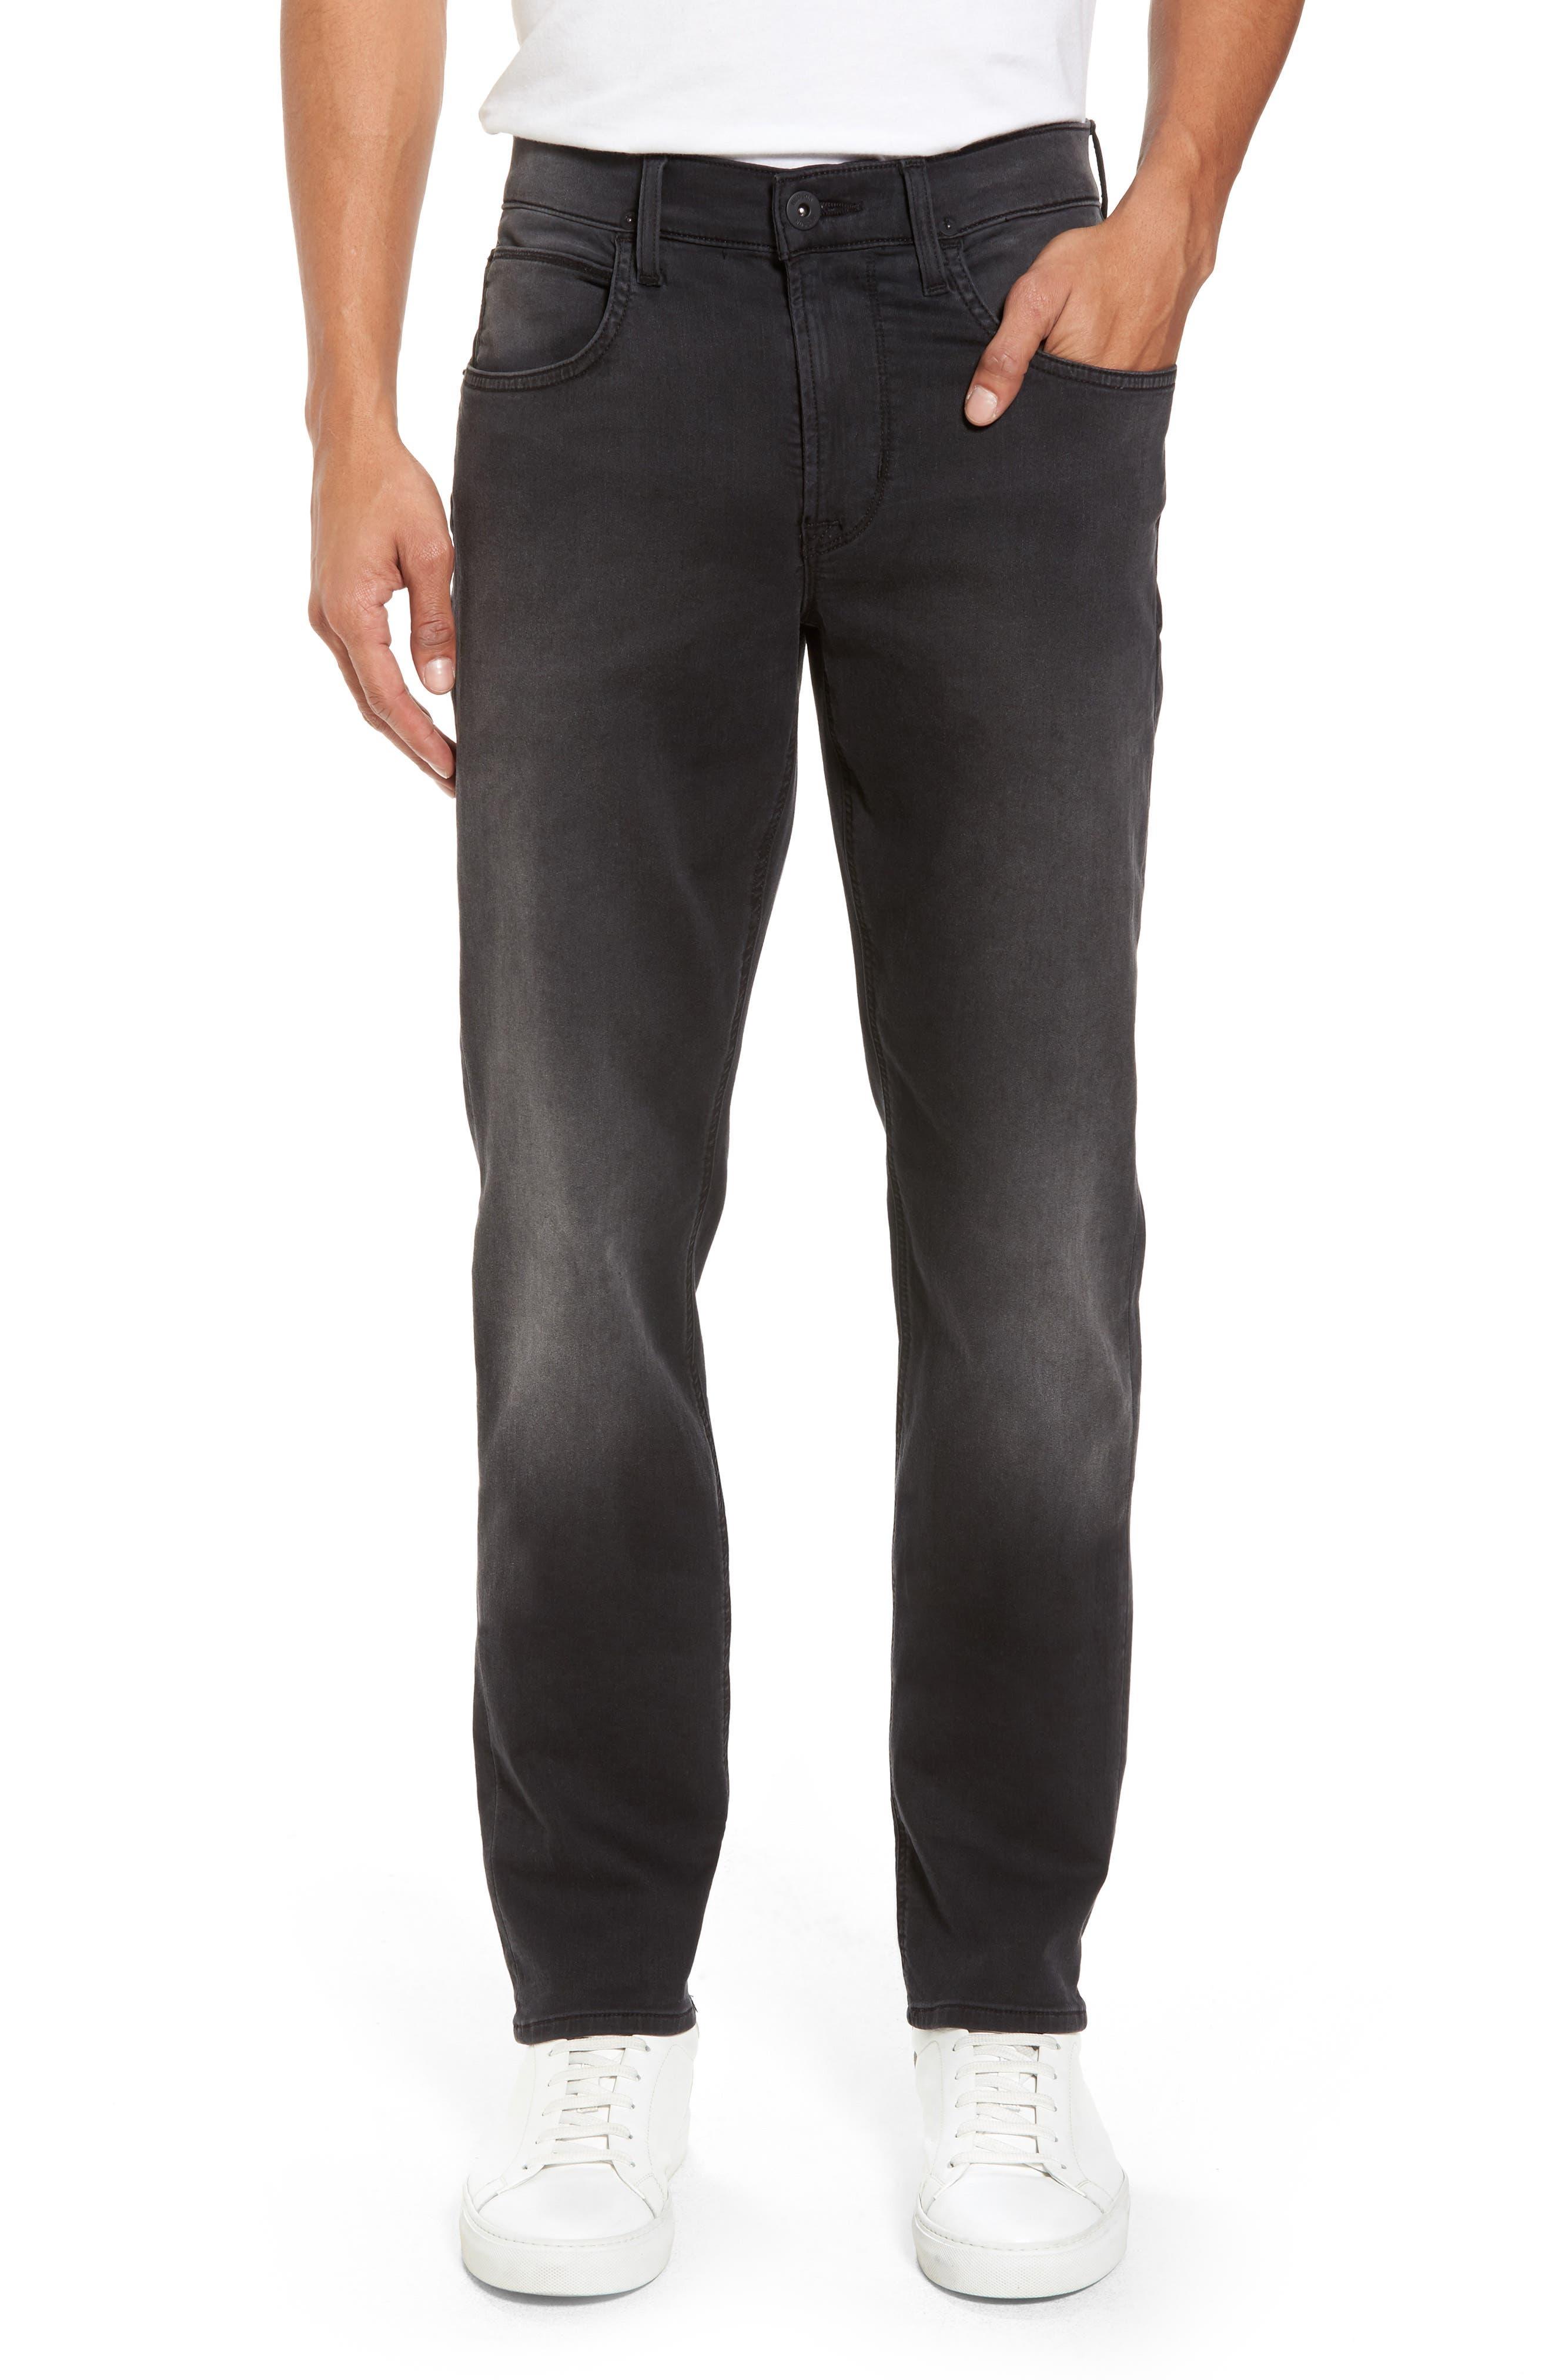 Blake Slim Fit Jeans,                             Main thumbnail 1, color,                             001